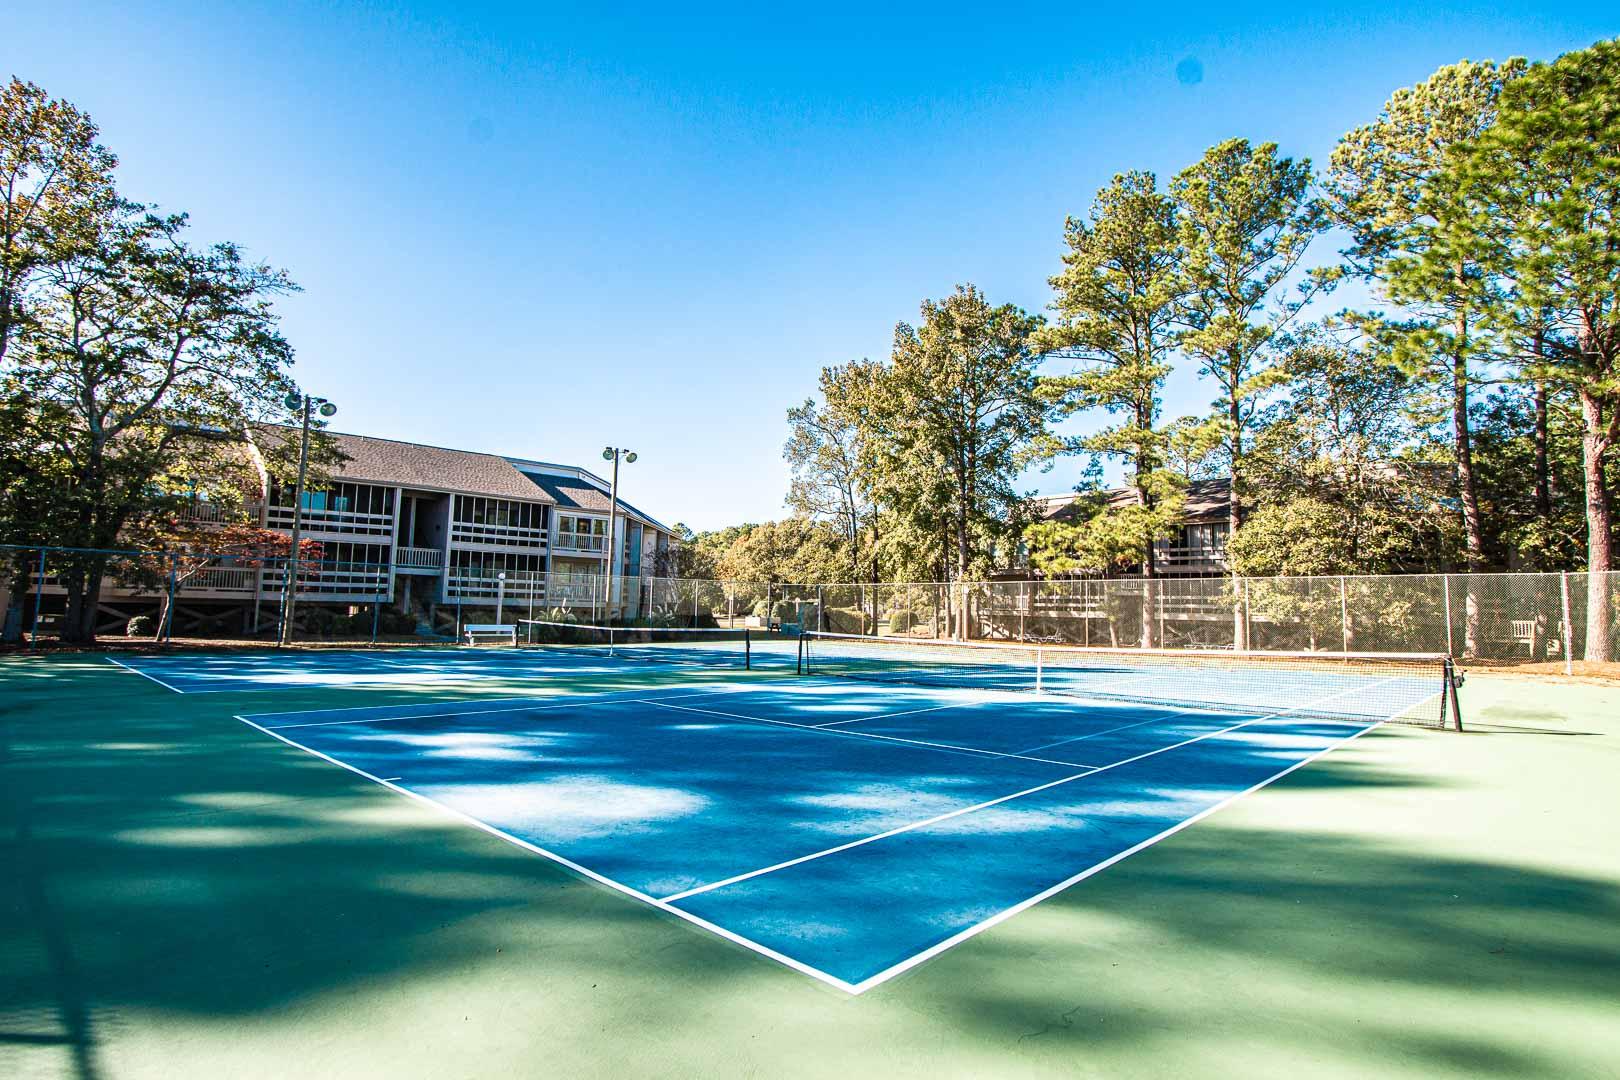 An outdoor tennis court at VRI's Sandcastle Village in New Bern, North Carolina.